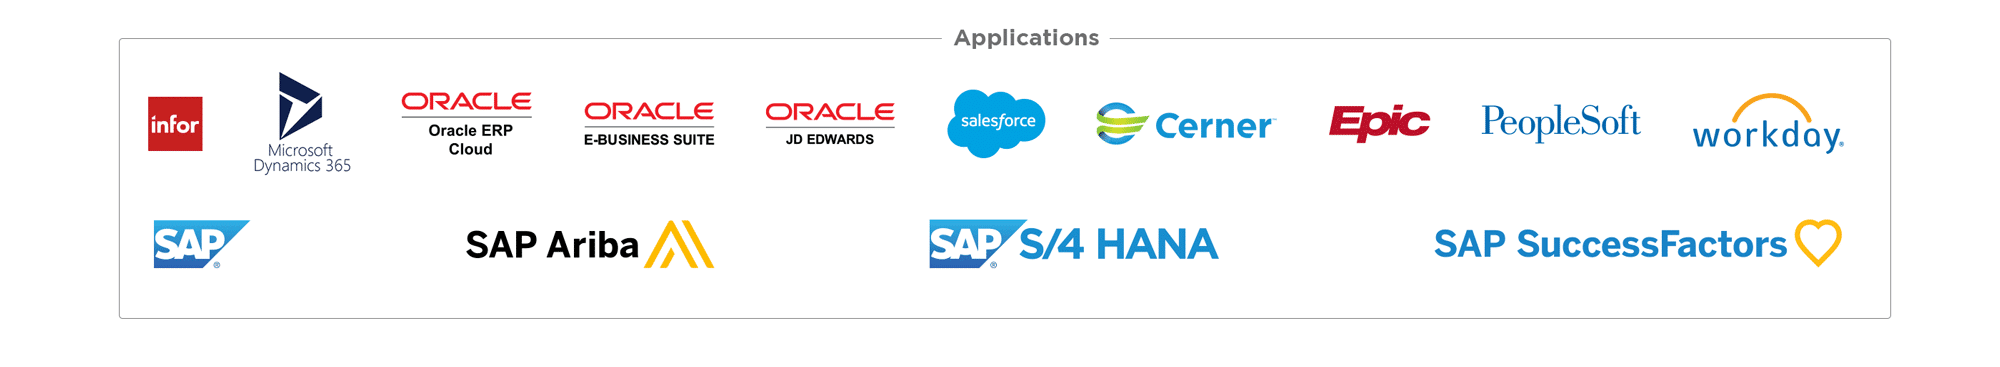 Application Access Governance integration partners.